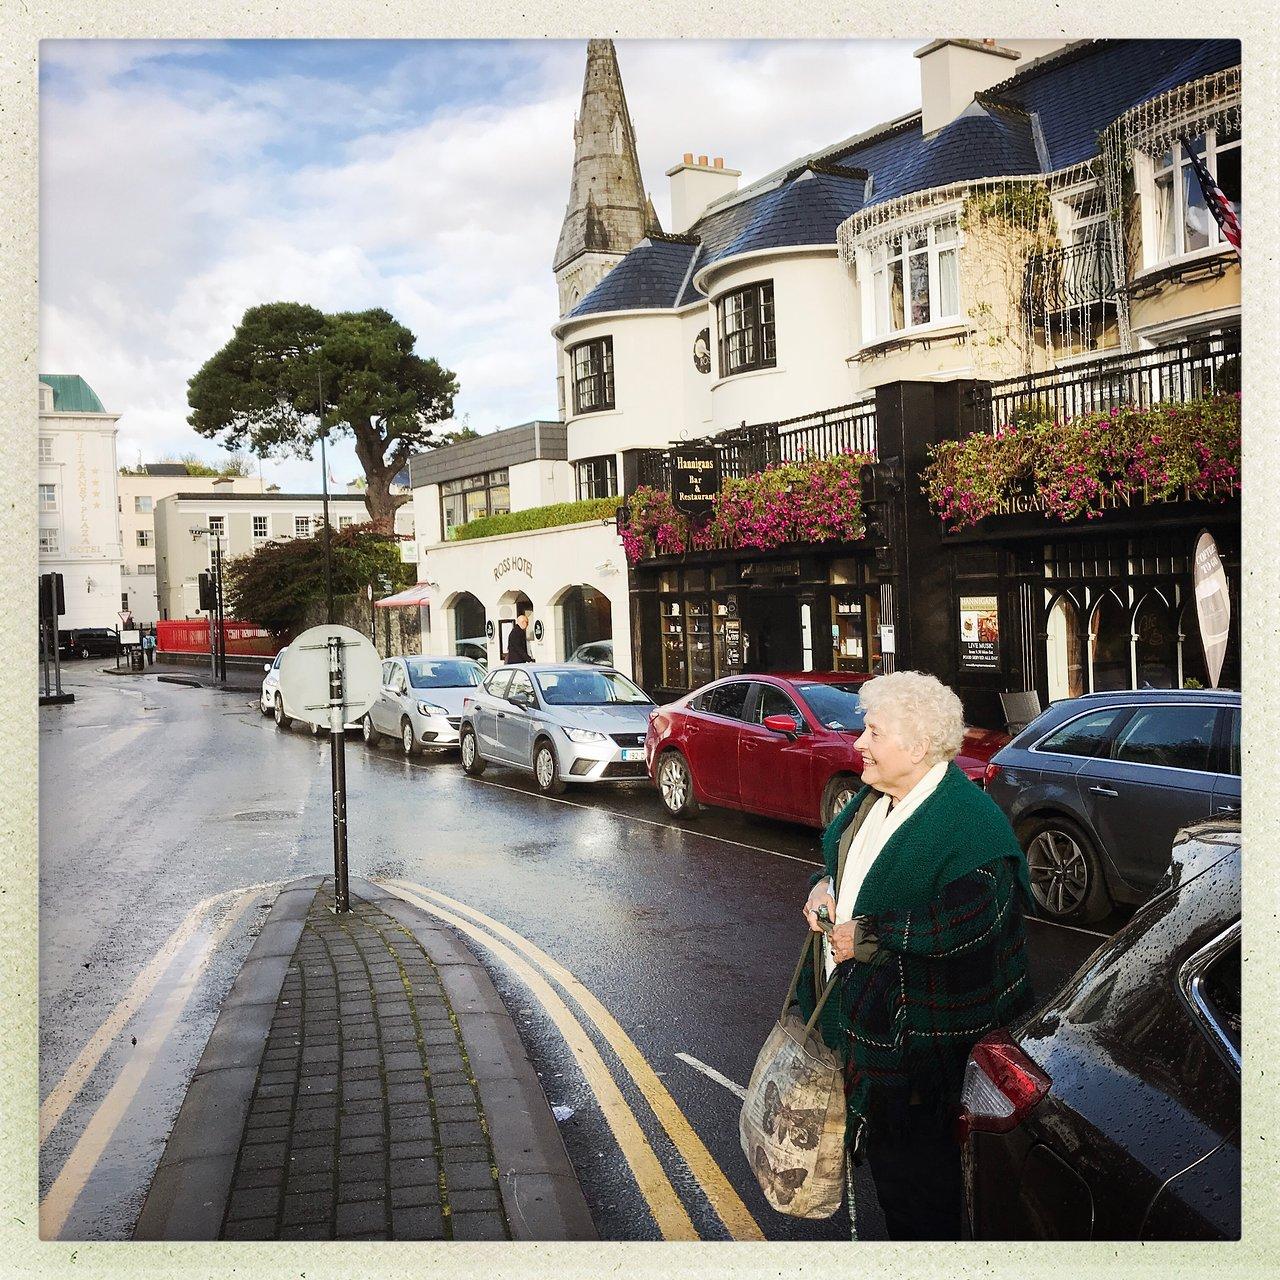 Killarney singles - Meet Killarney lonely people in Ireland